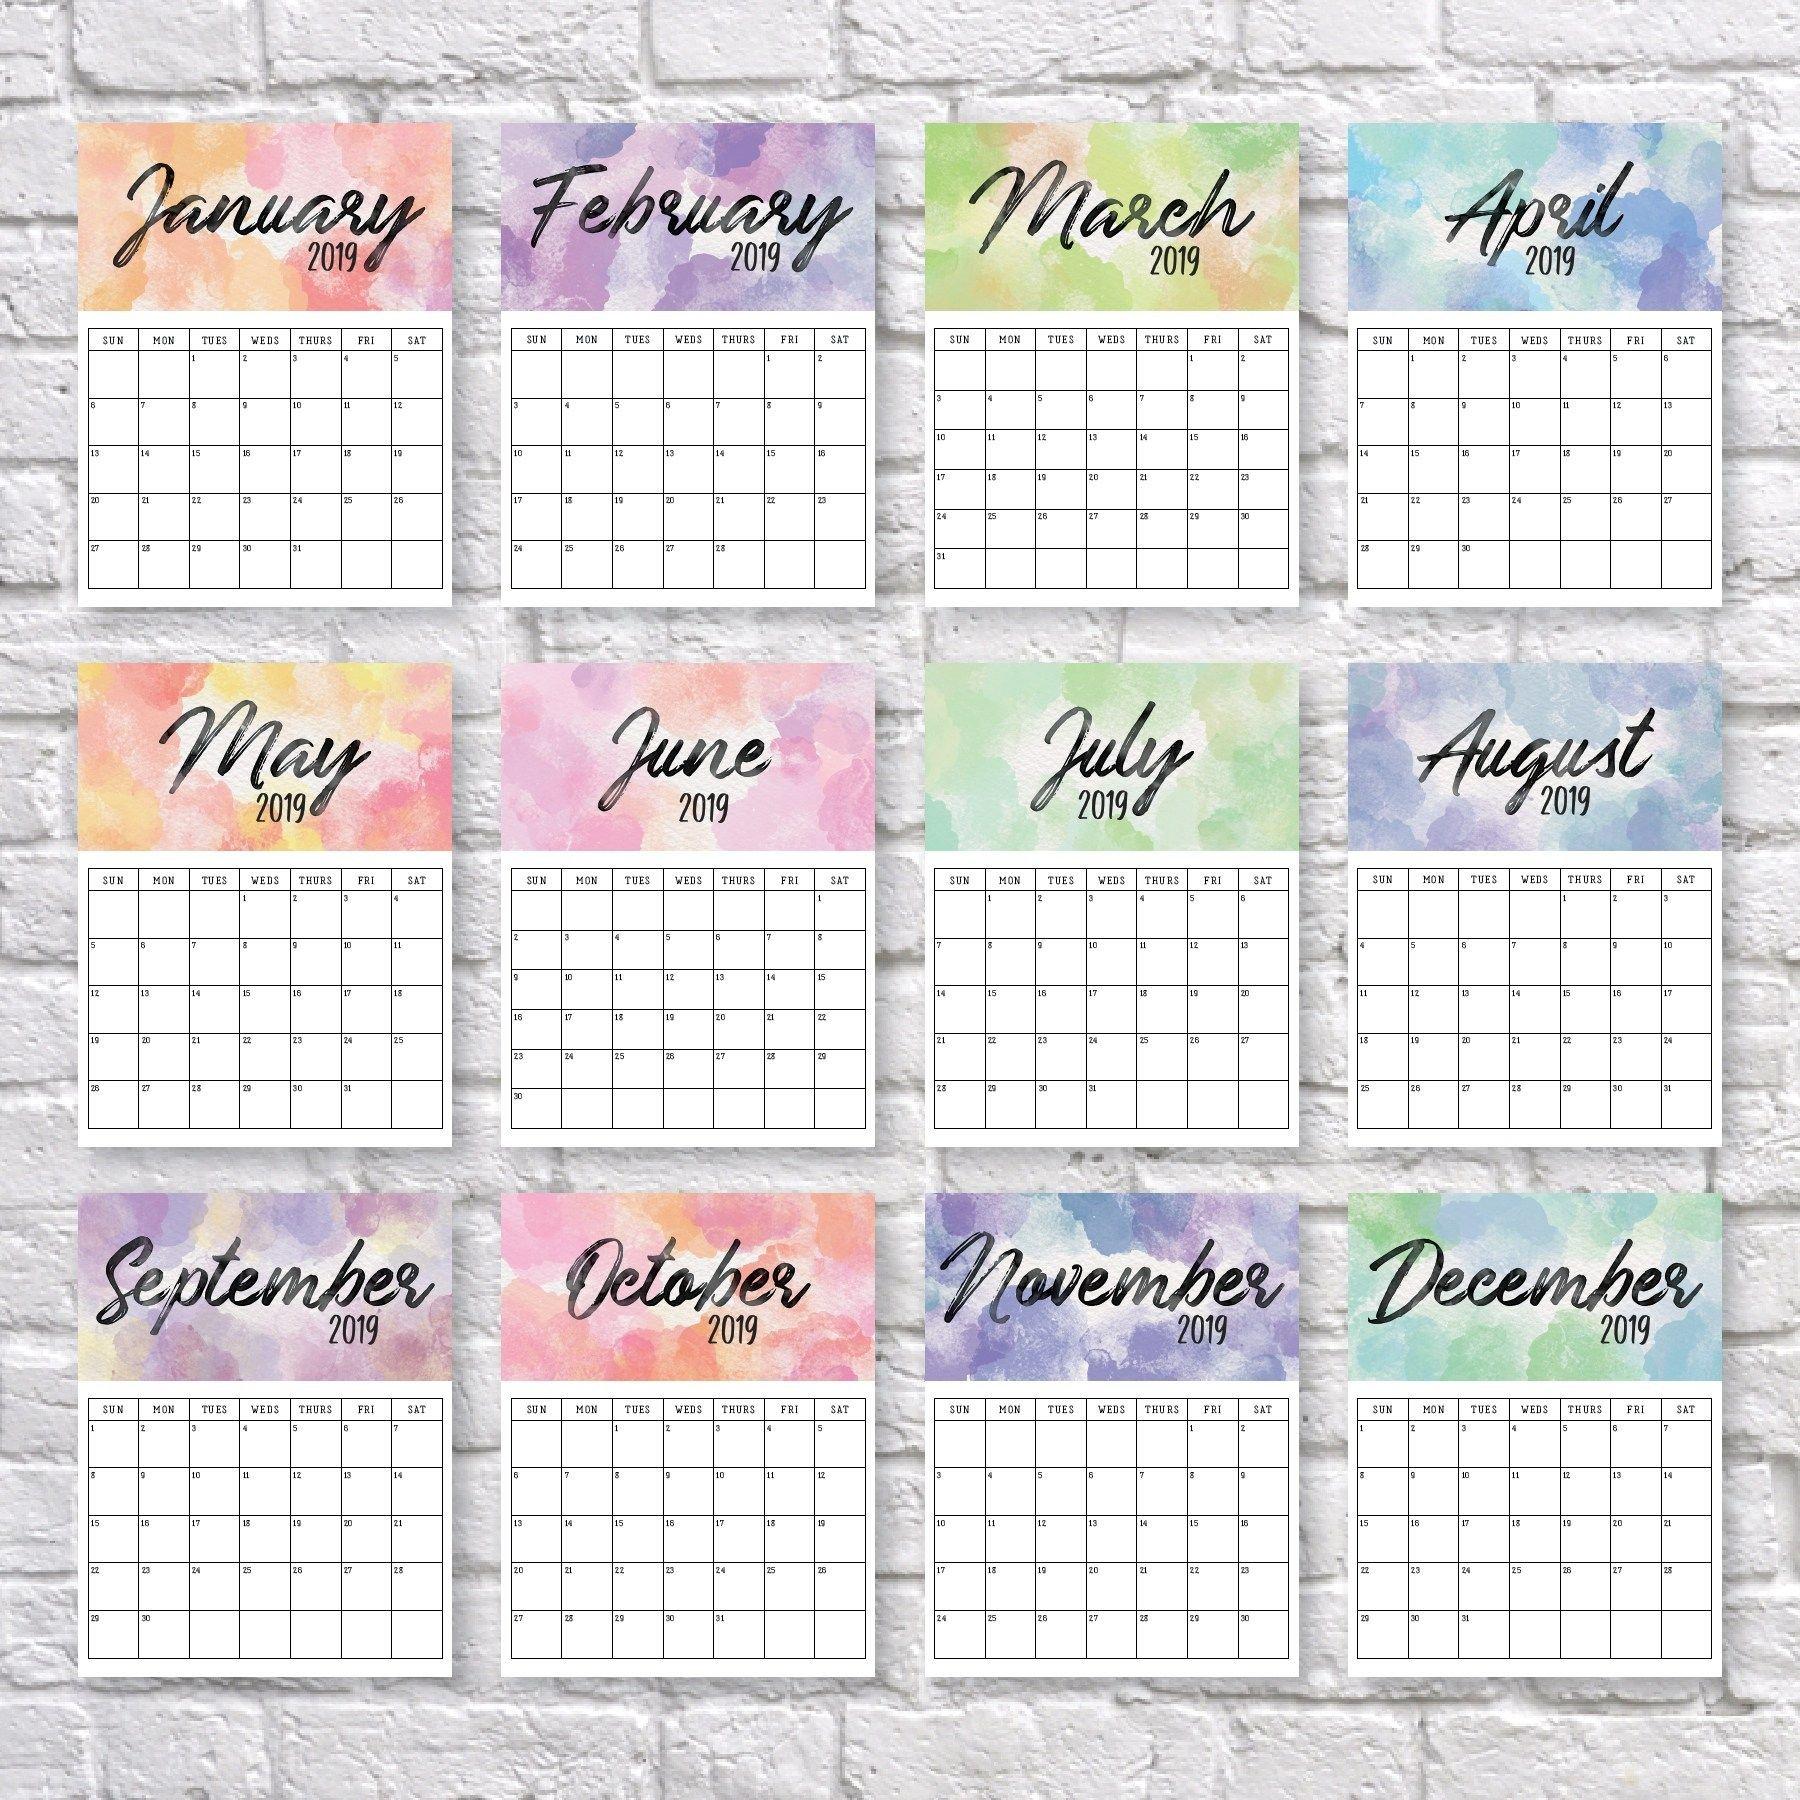 2020 Printable Calendar | Календарь Для Печати, Календарь 5.5 X 8.5 Inch Calendar